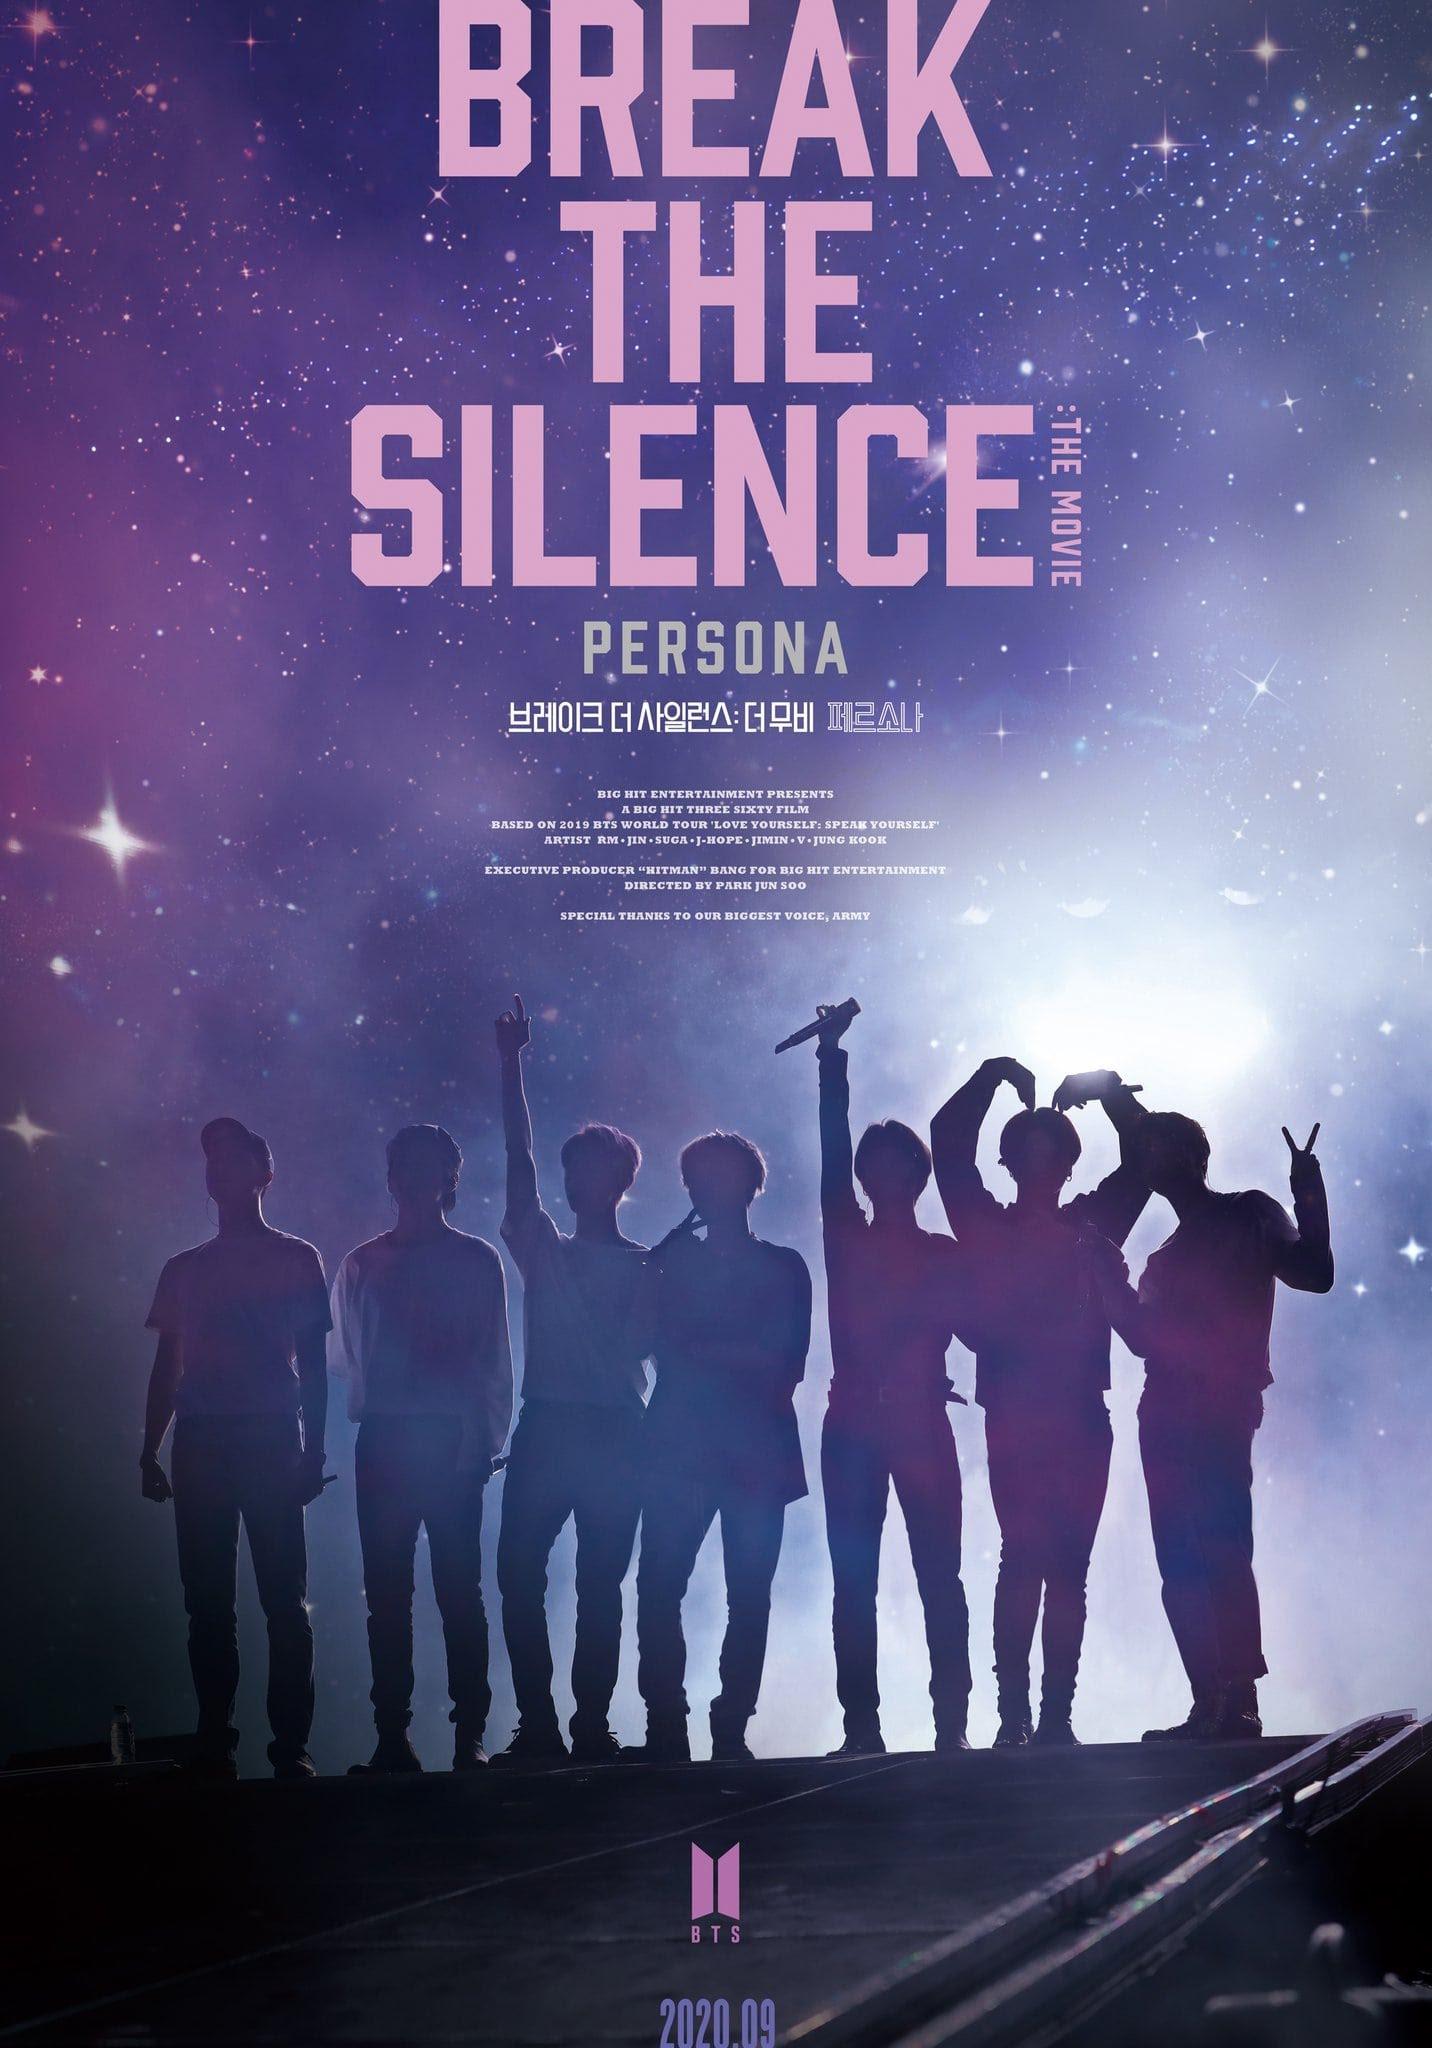 bts-break-the-silence-the-movie-2